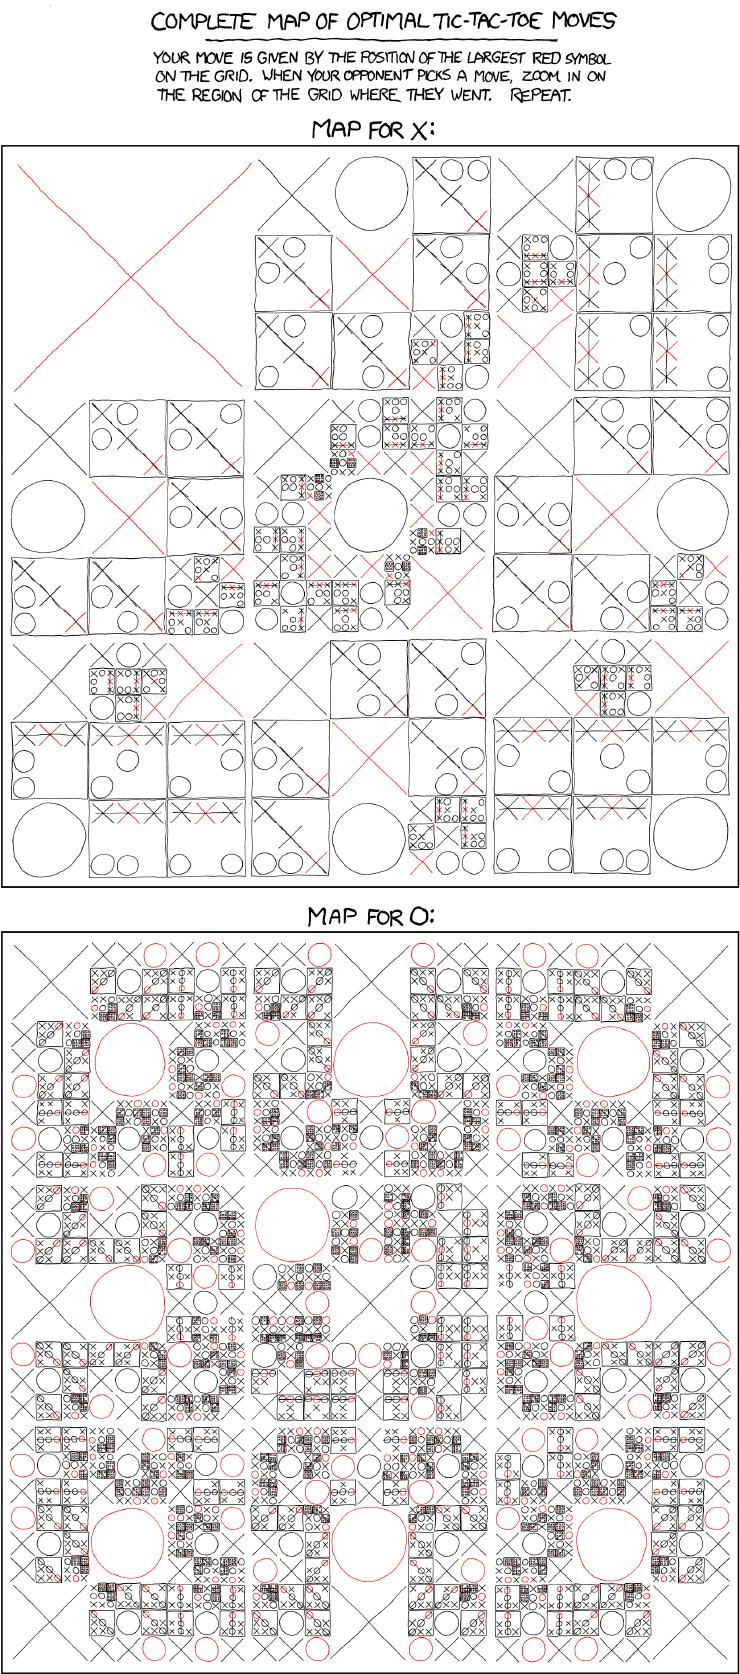 Xkcd shirt design - Tic Tac Toe